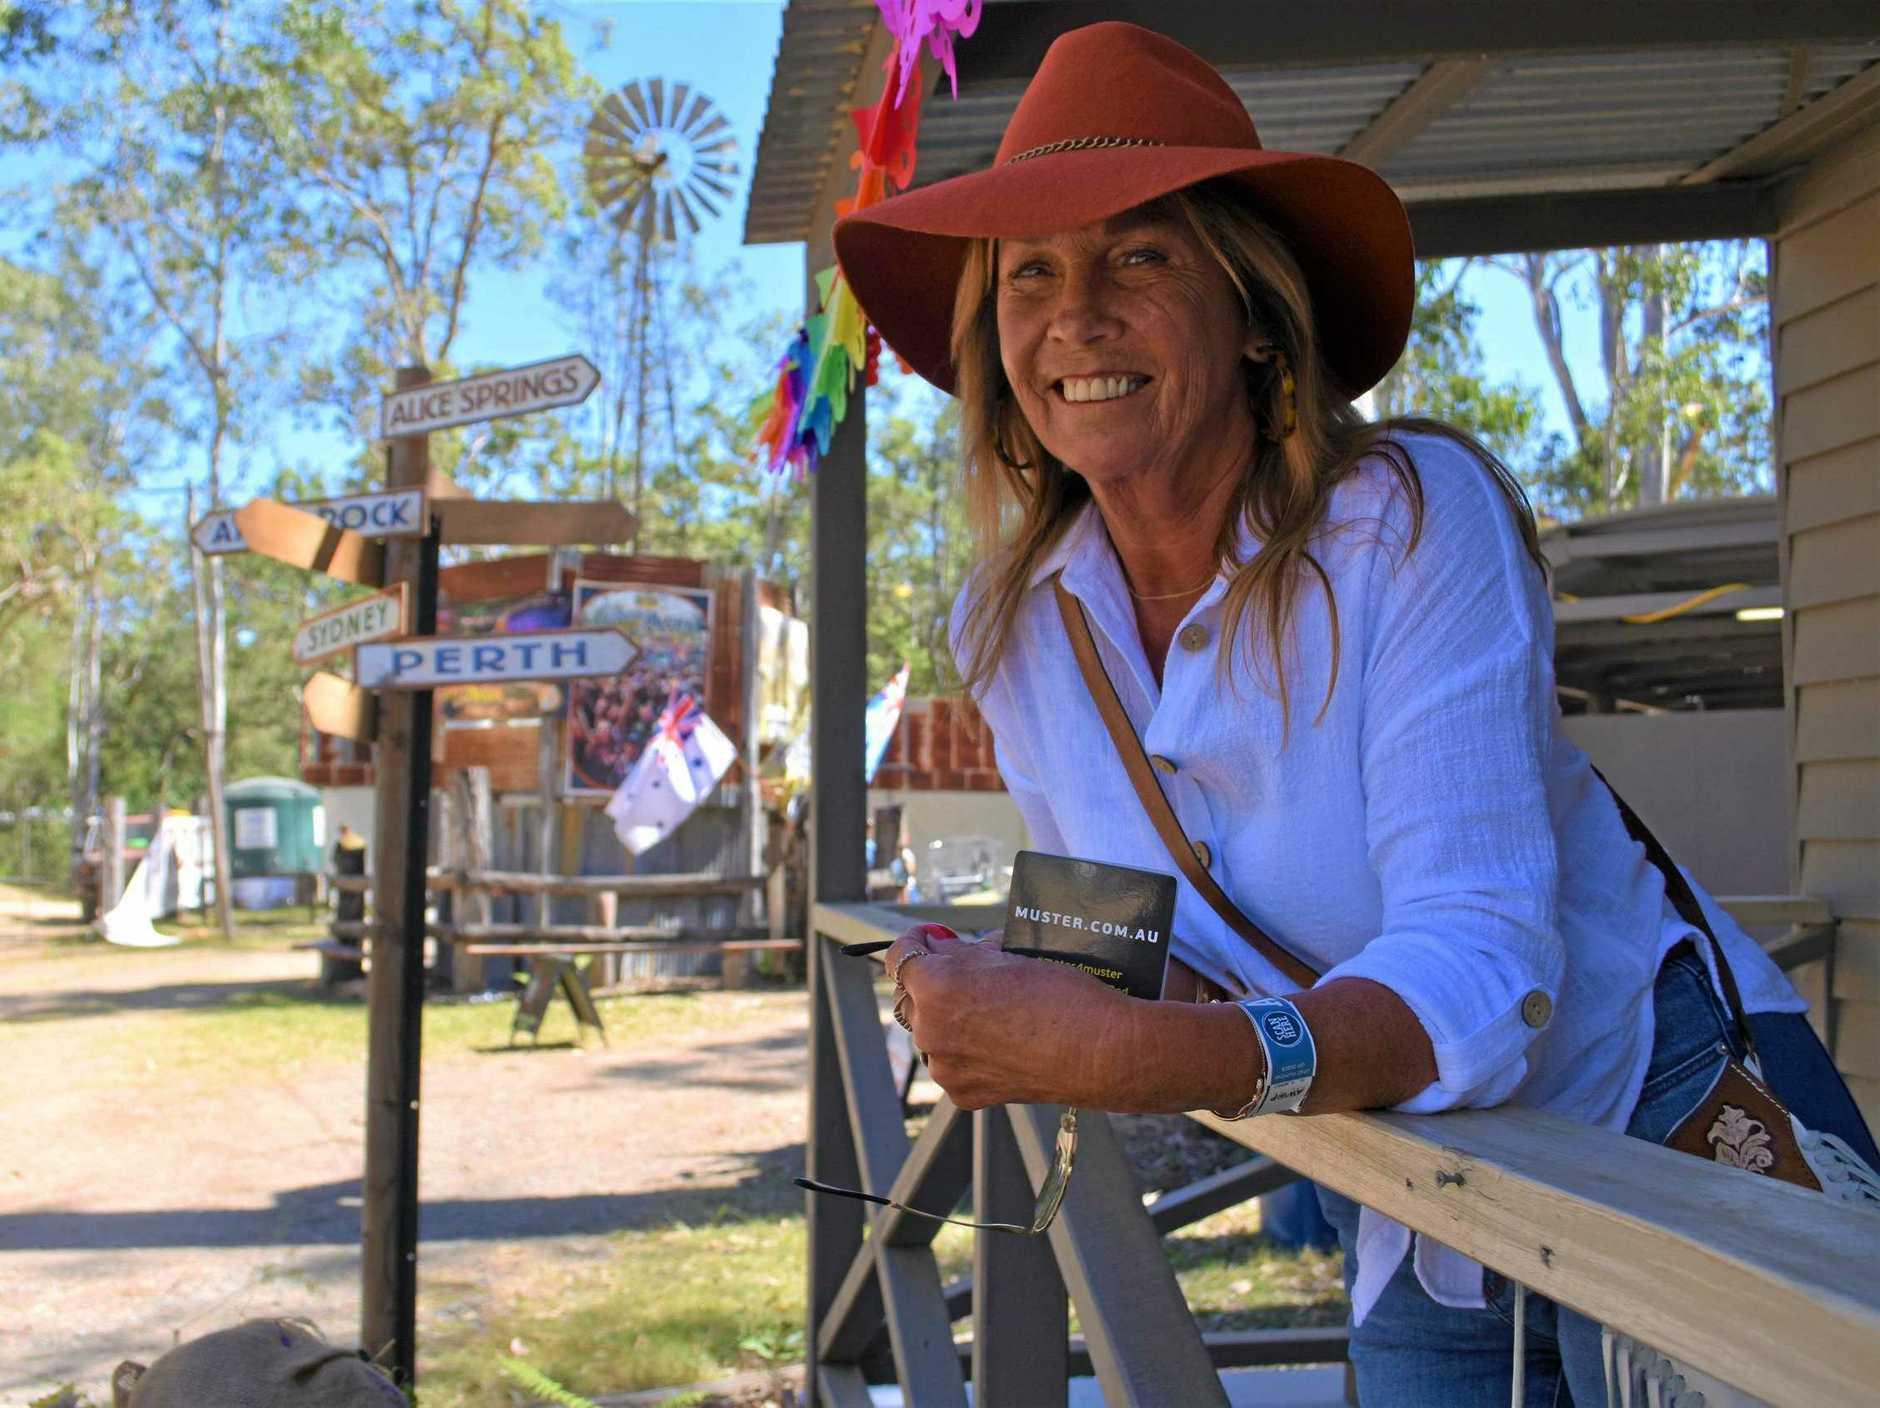 MUSTAHADABLAST: Jenni Randle at her camp.